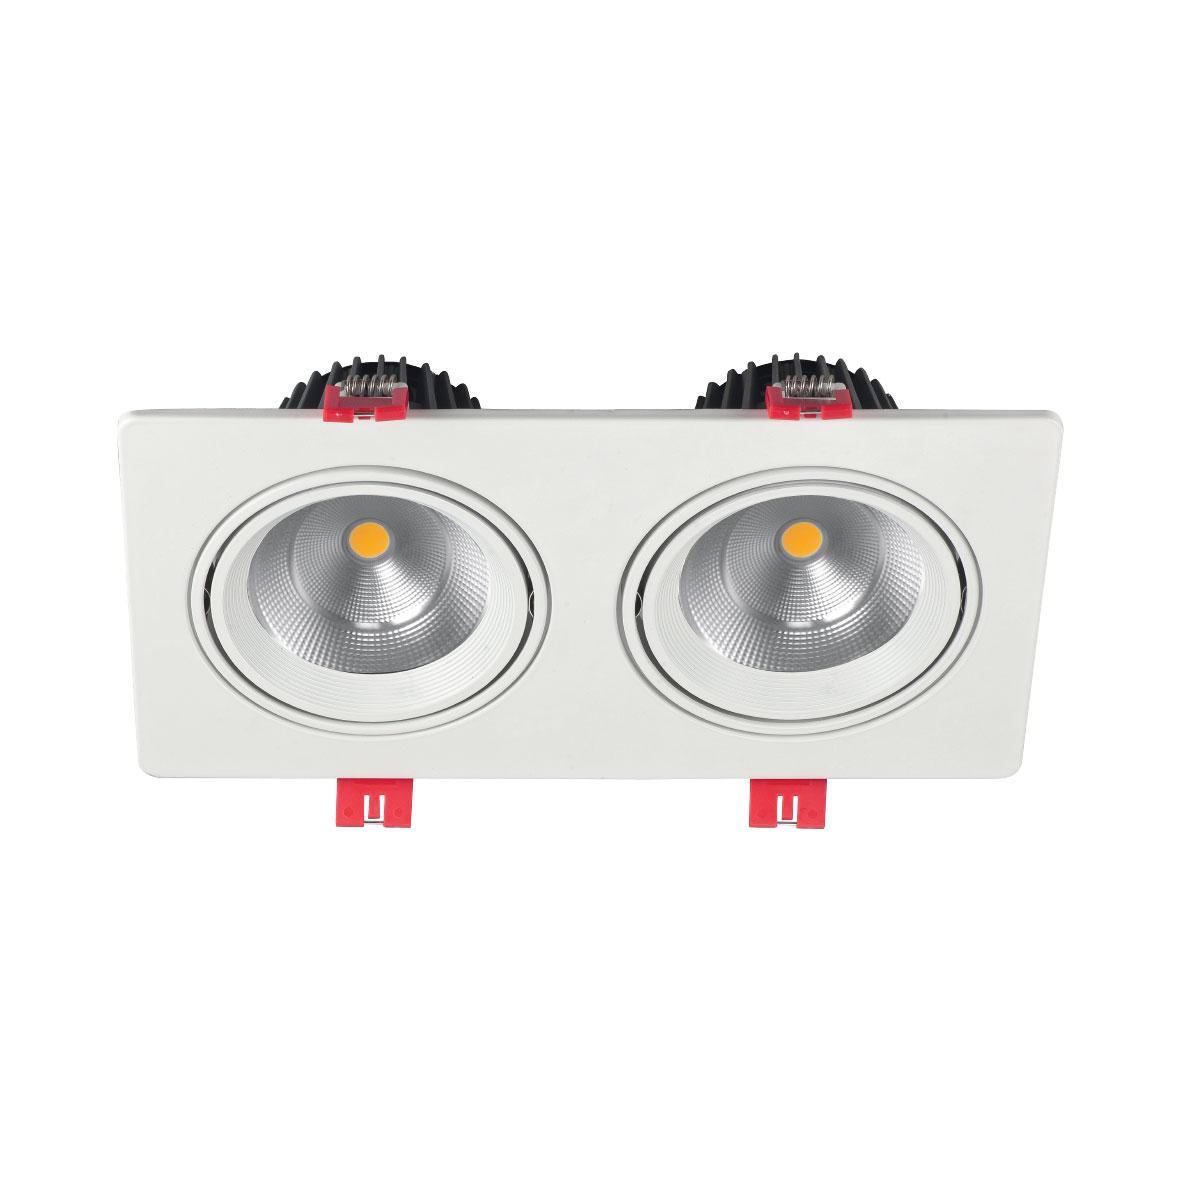 چراغ سقفی توکار SH-6502-2x24W